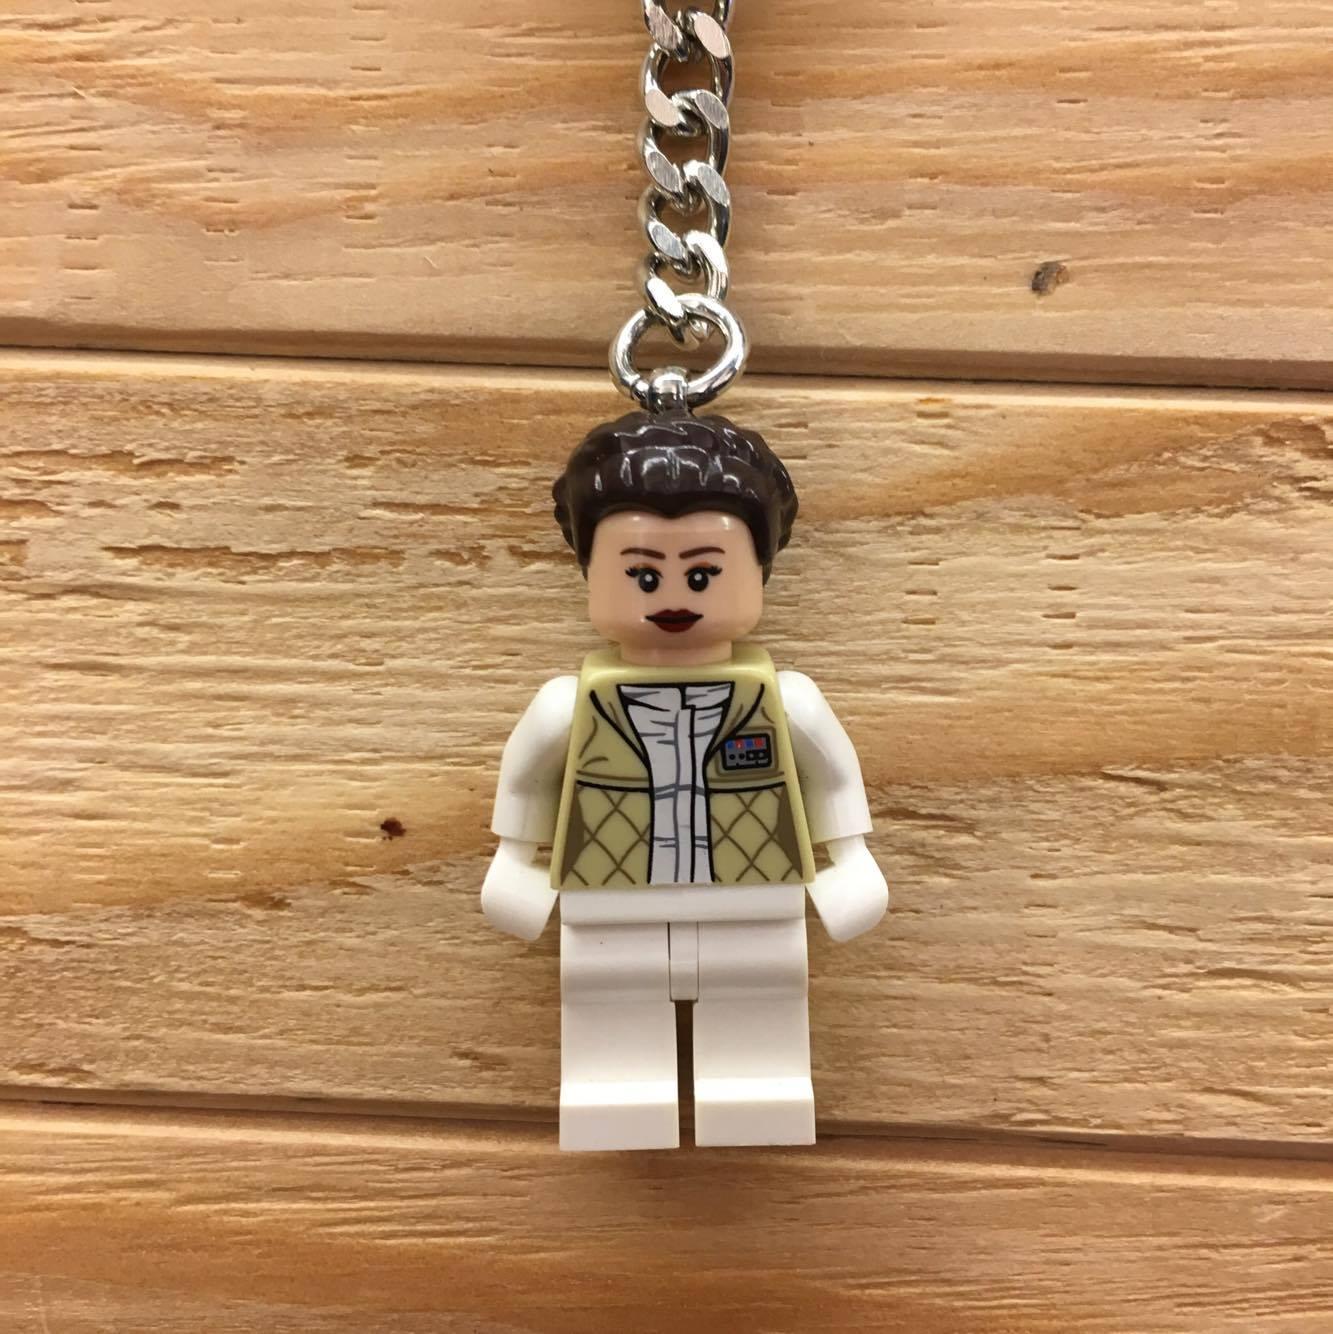 BEETLE LEGO STAR WARS PRINCESS LEIA 星際大戰 莉亞公主 樂高 積木 鑰匙圈 玩具